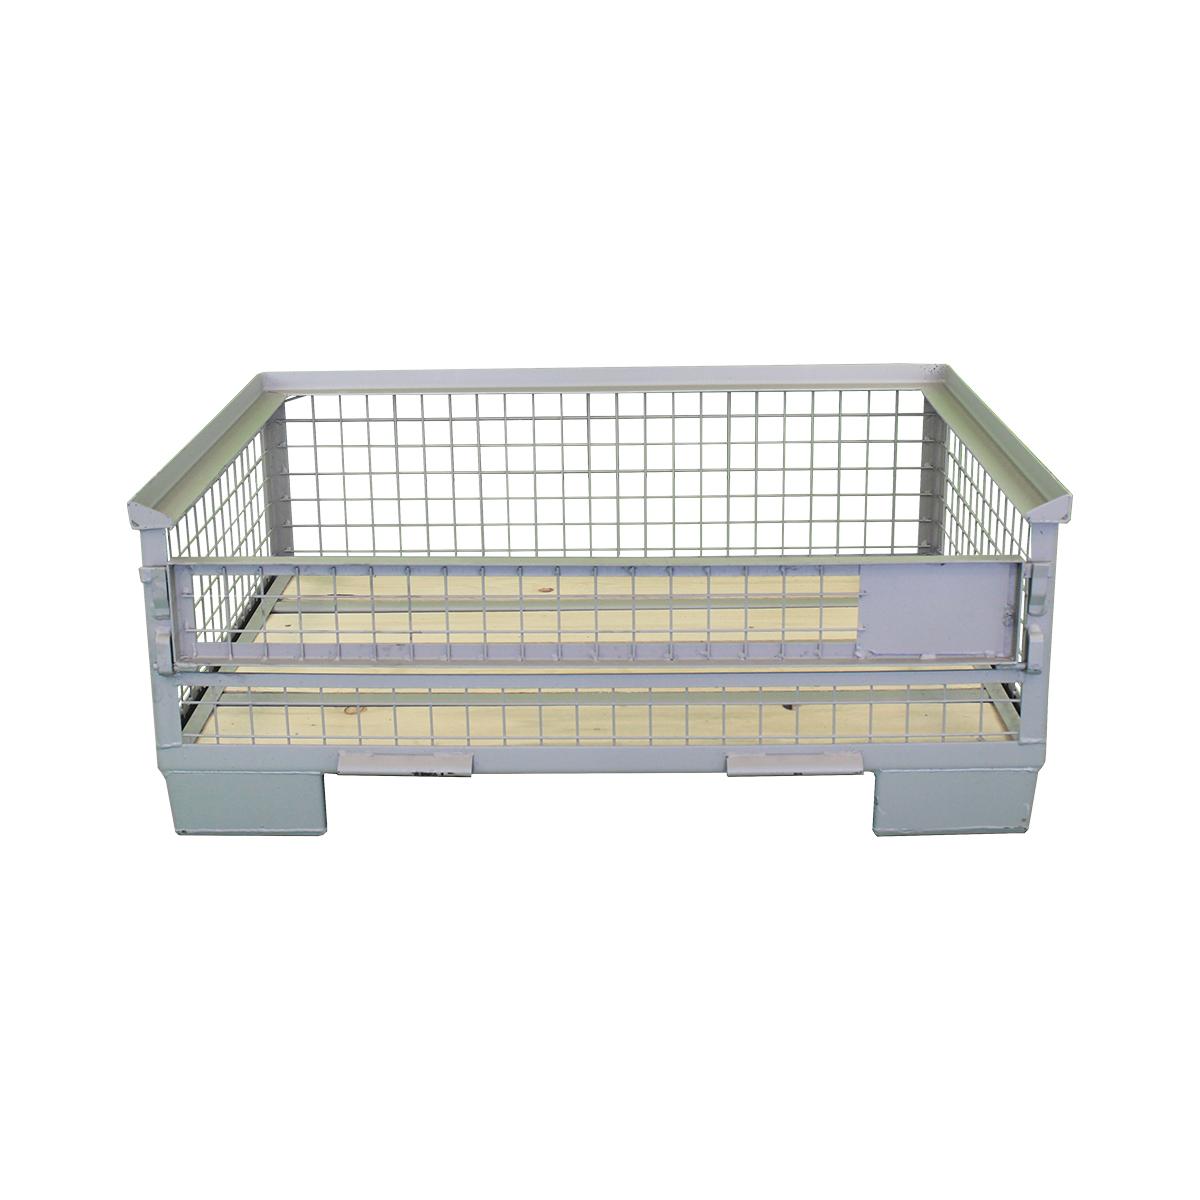 Halbhohe Industriegitterboxpalette 500 mm